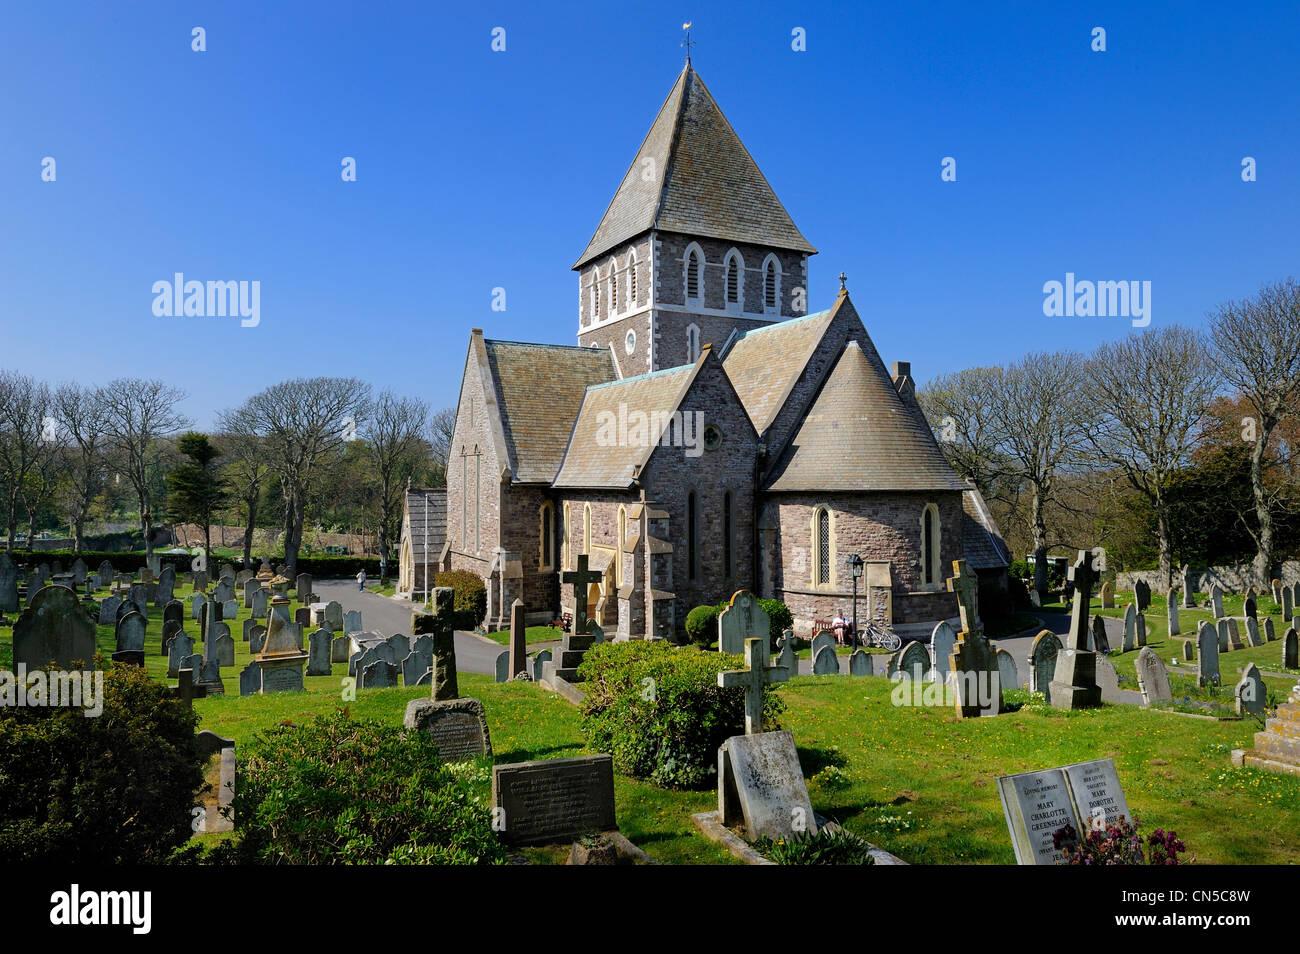 United Kingdom, Channel islands, Alderney, St Anne's church - Stock Image